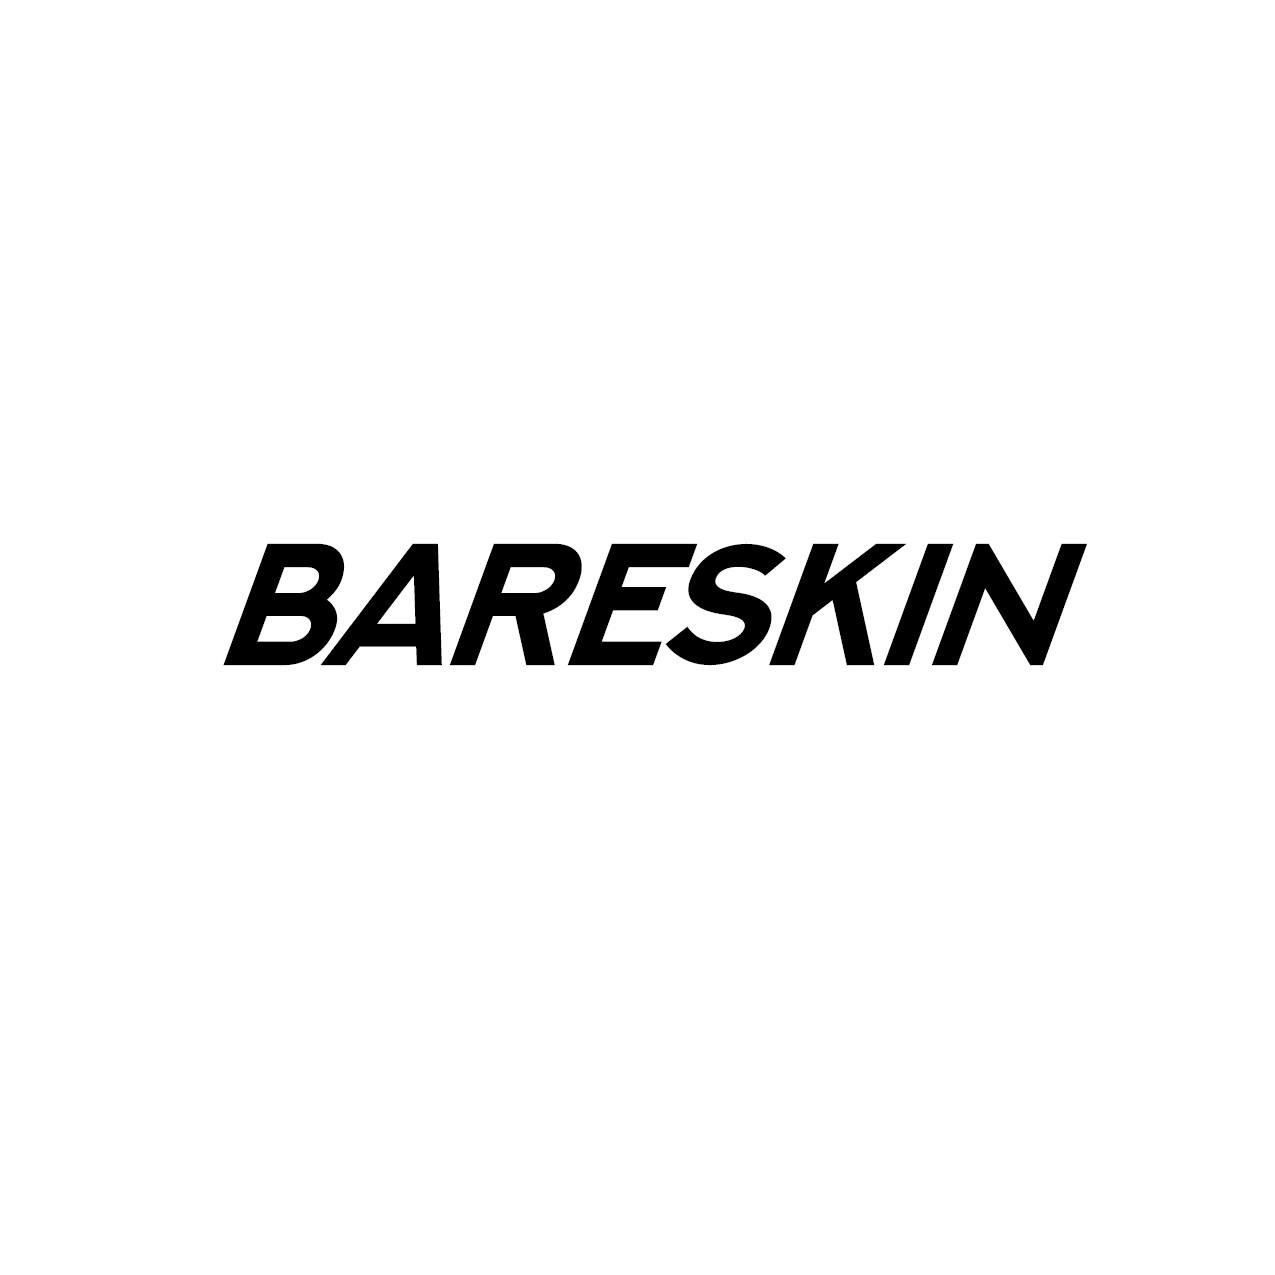 Bareskin